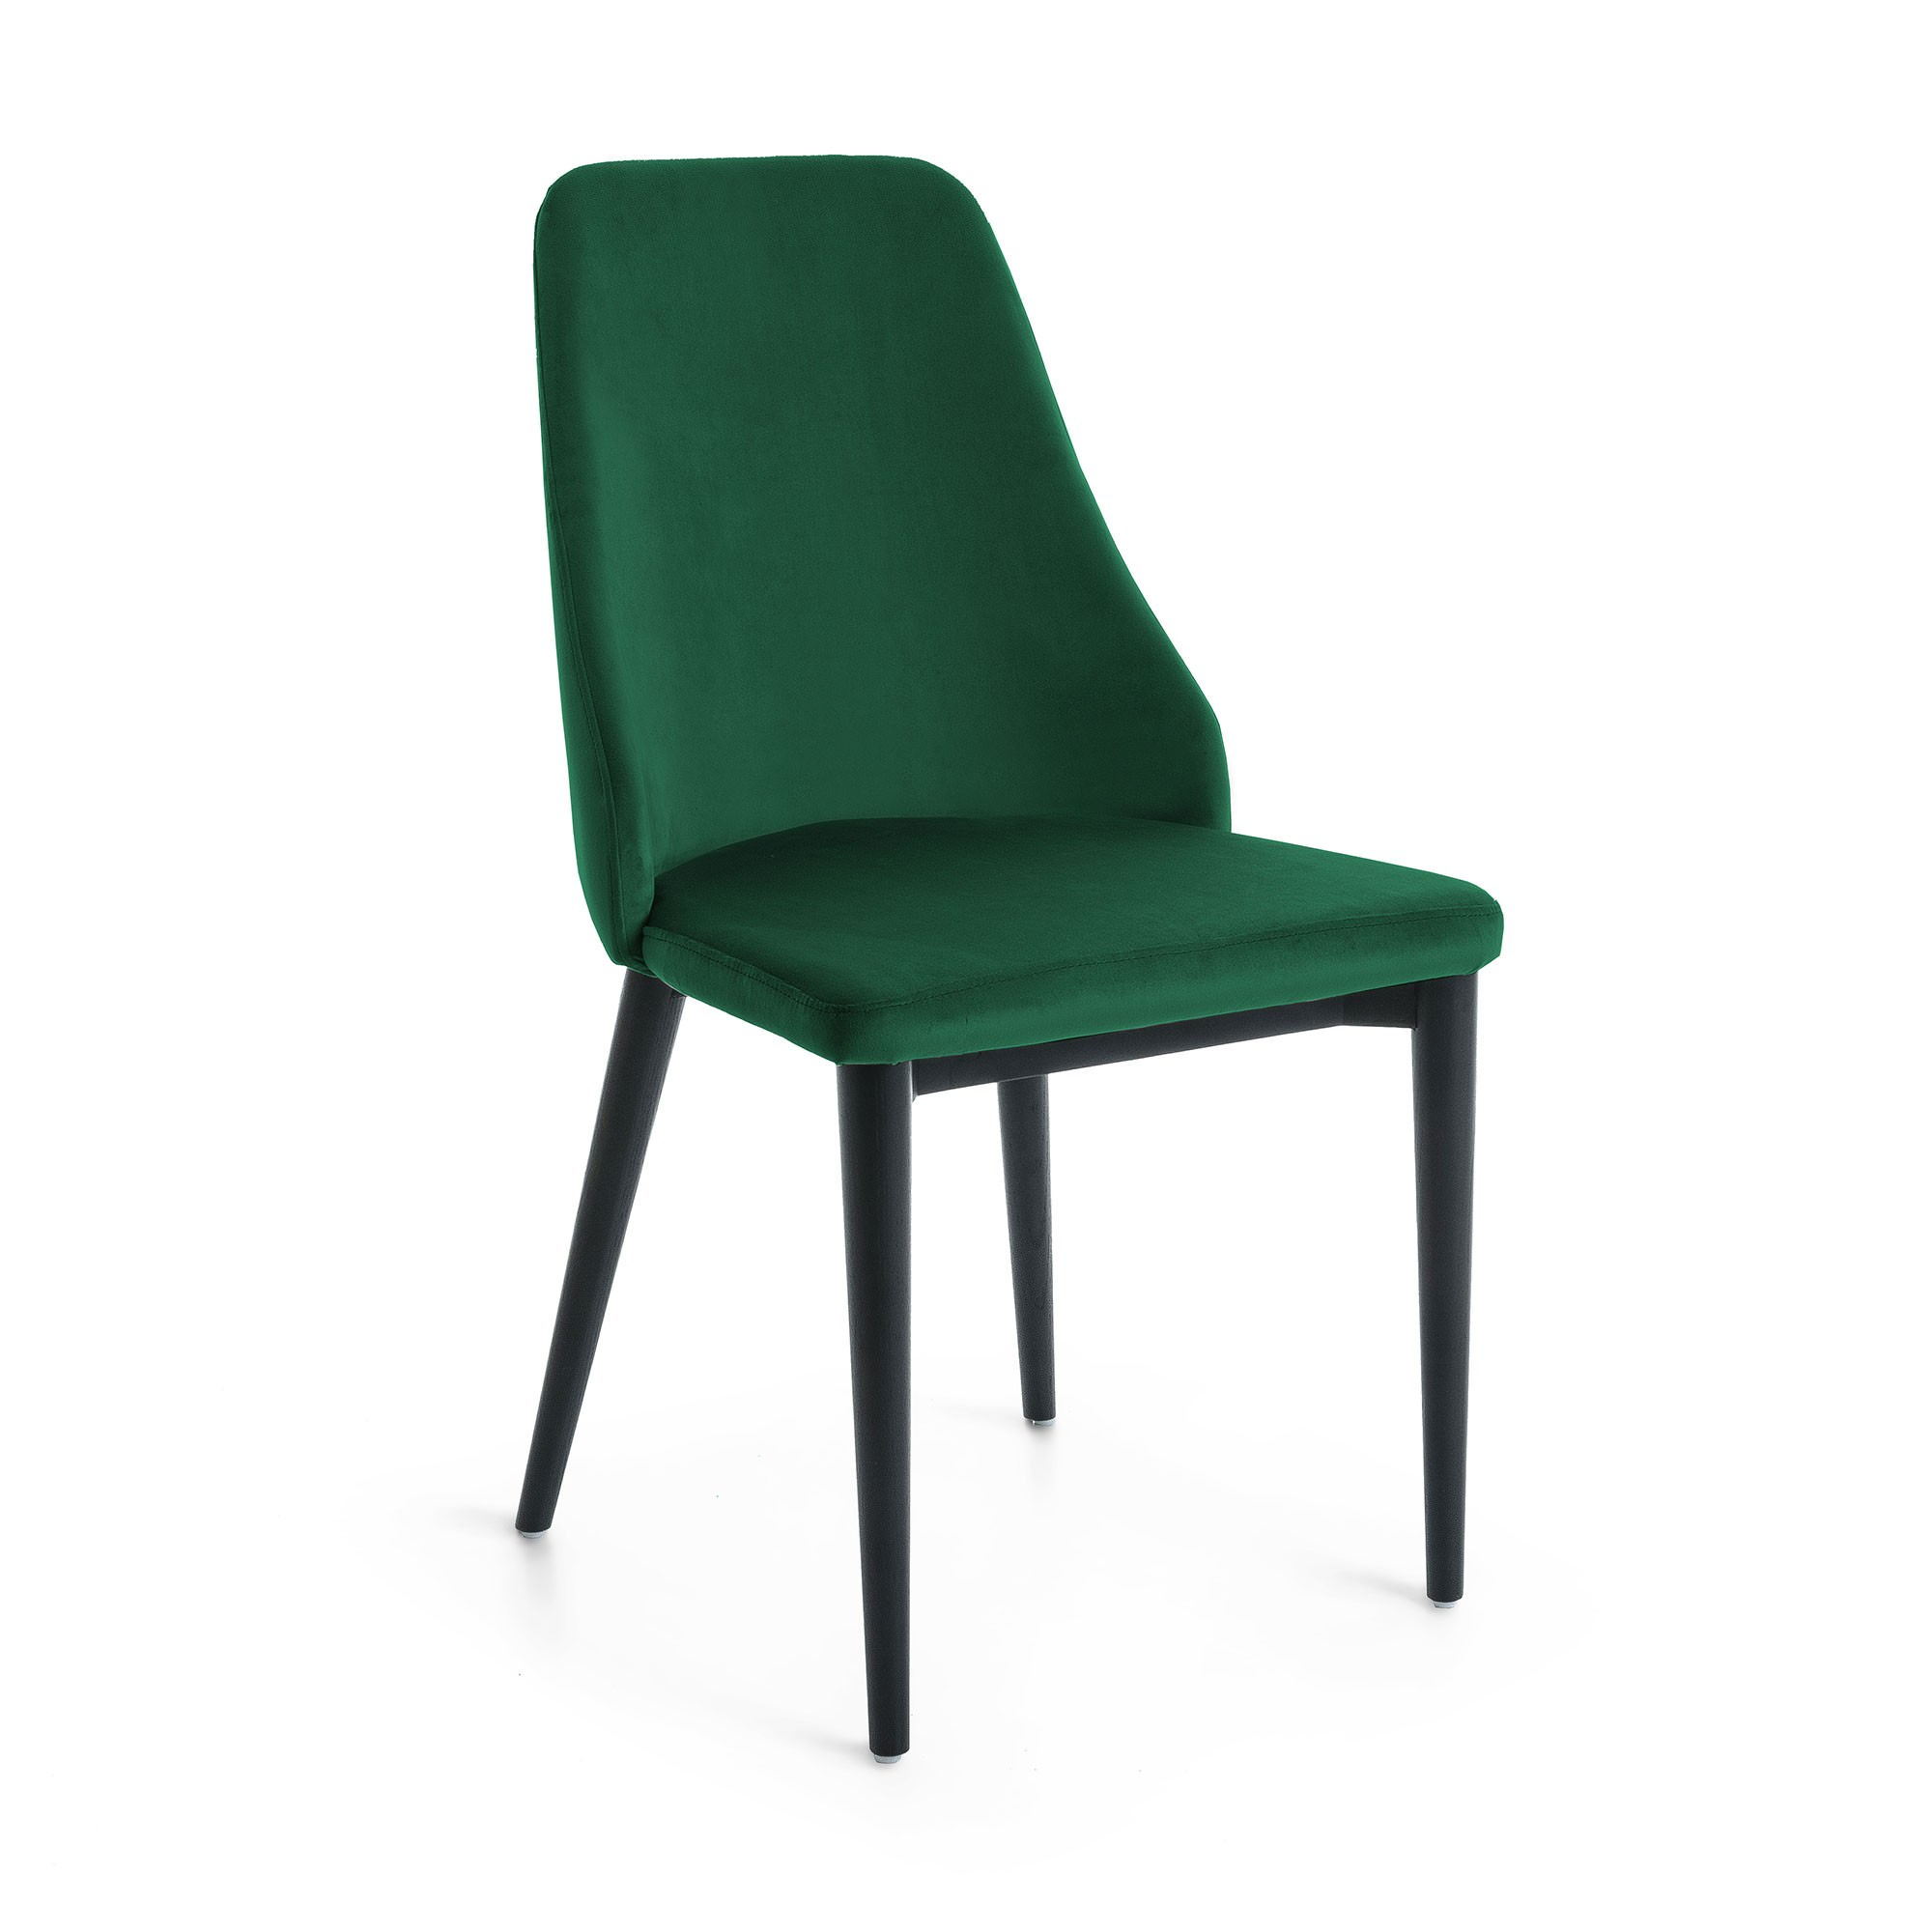 Roxy Velvet Fabric Dining Chair, Green / Black